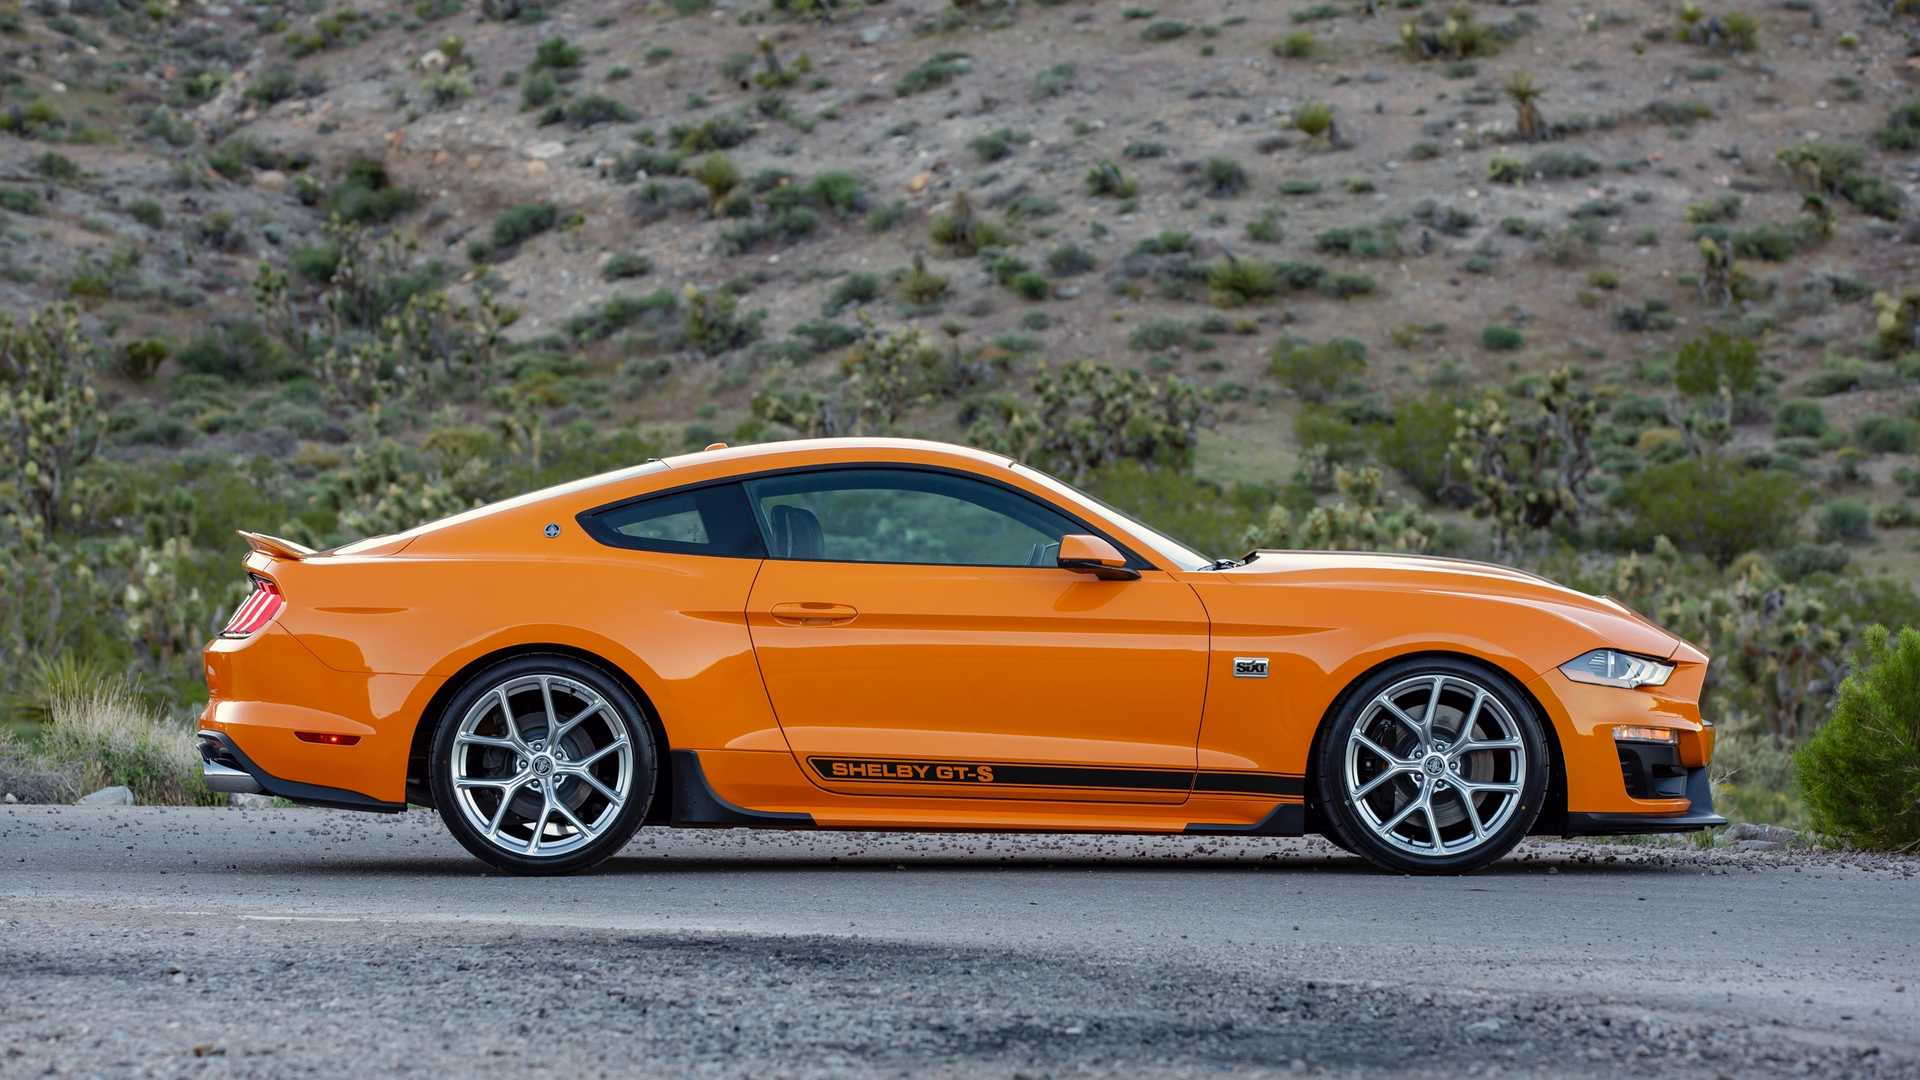 Ford Mustang Gt Rental